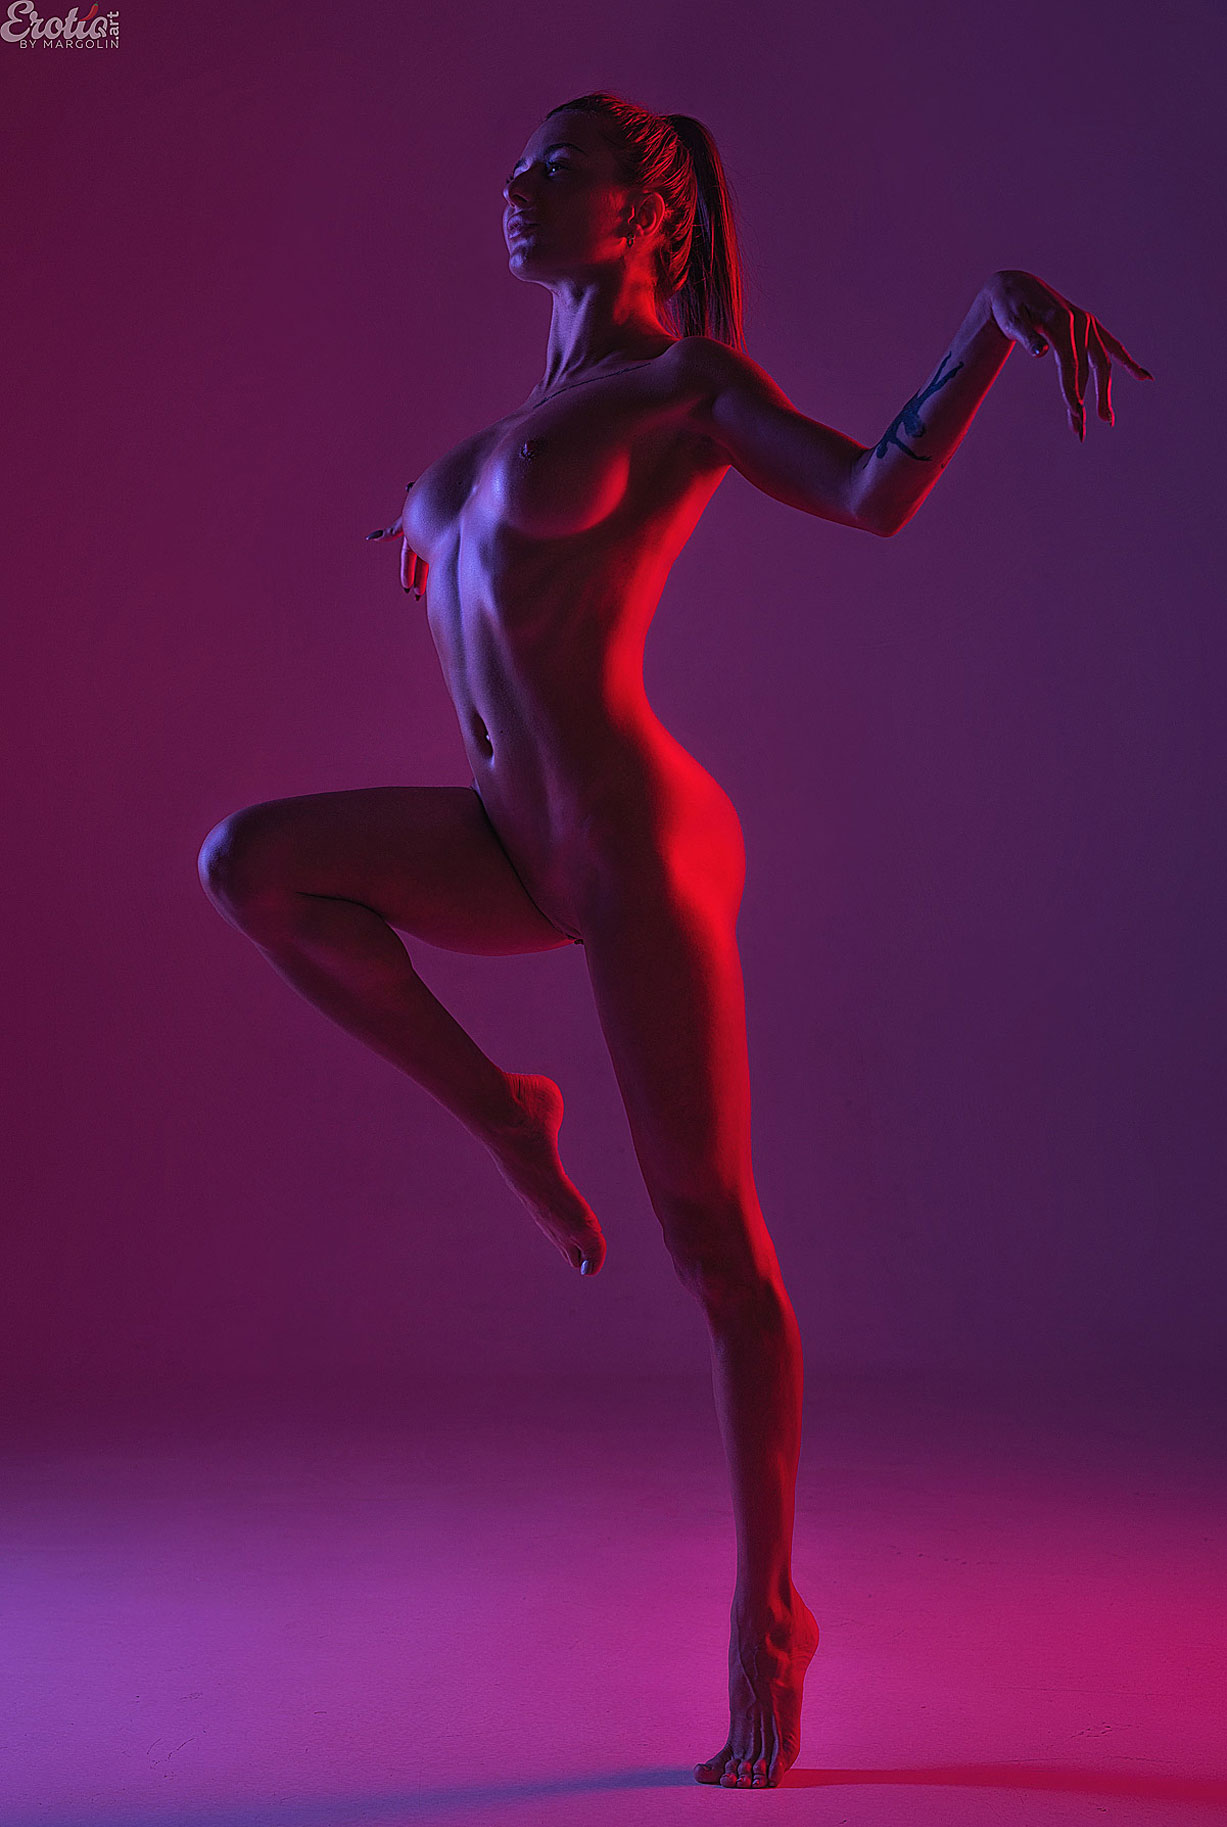 Sandra Wellness nude by Alexander Margolin